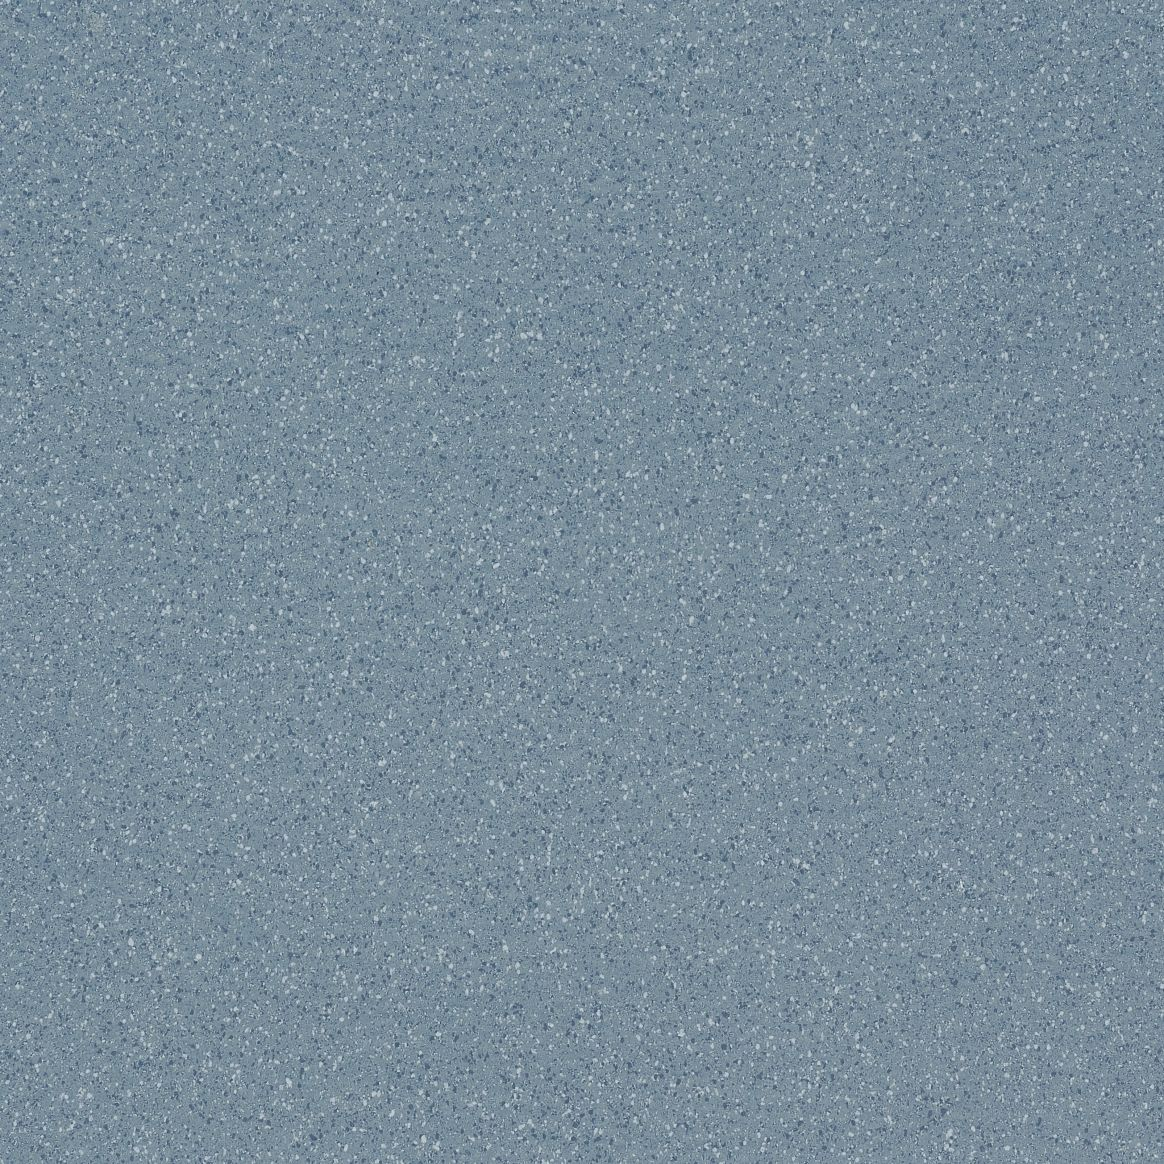 Blue Saturn thumbnail